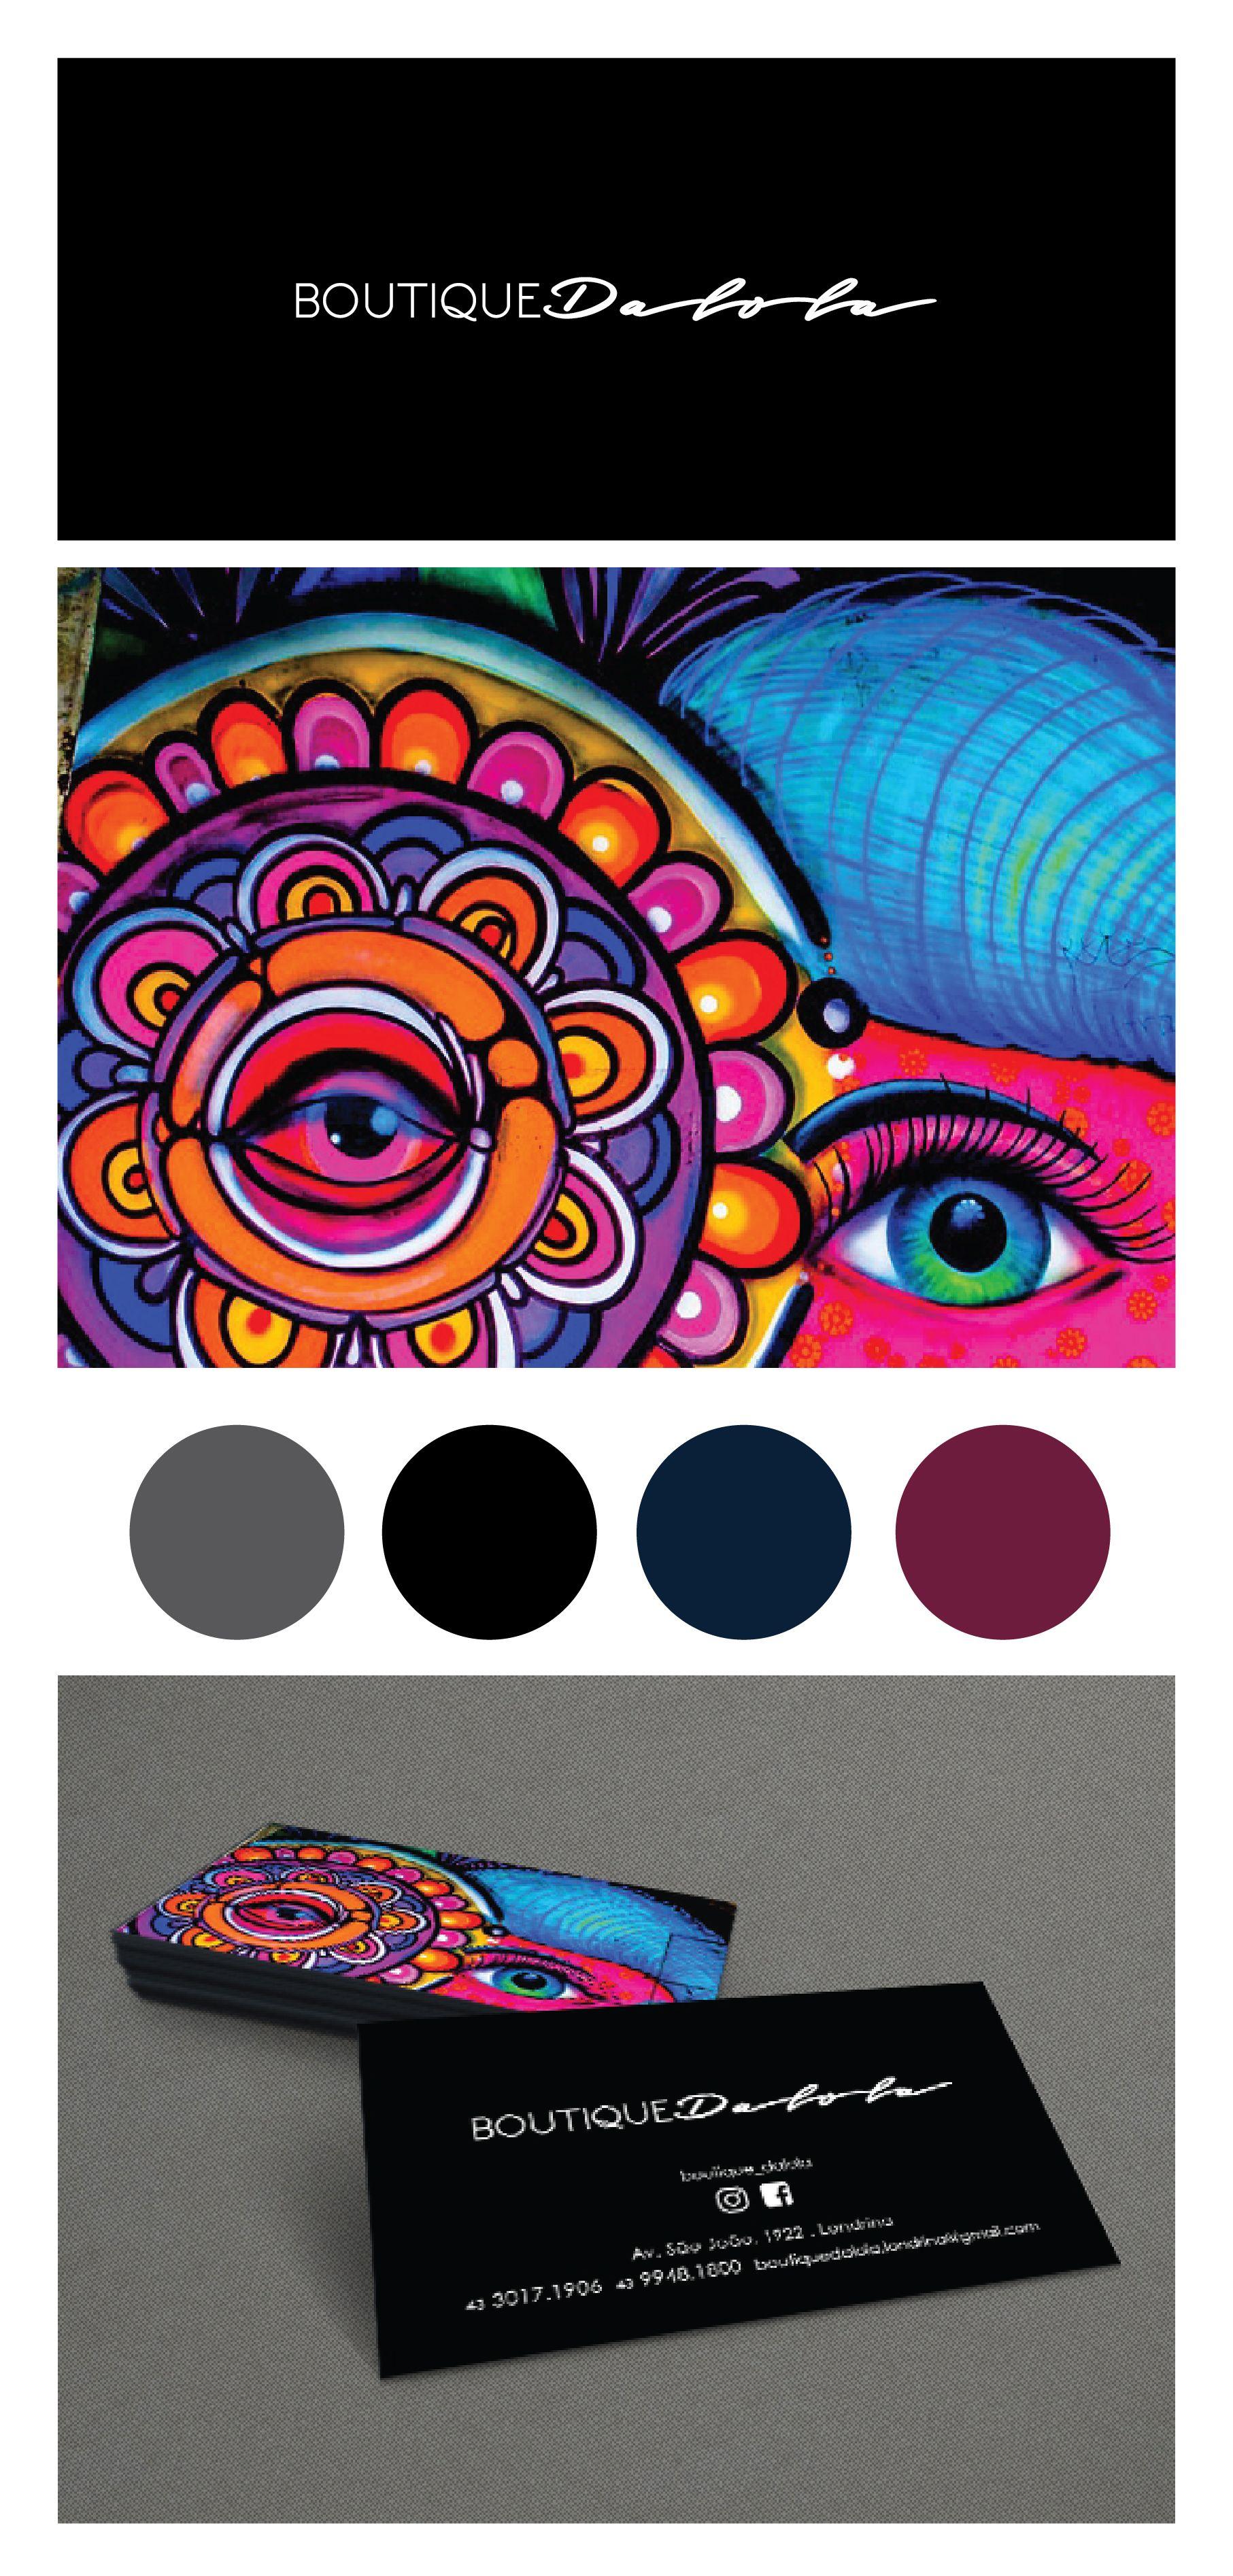 Identidade visual   Cliente: Boutique Dalola   Vanessa Balestri . Arte